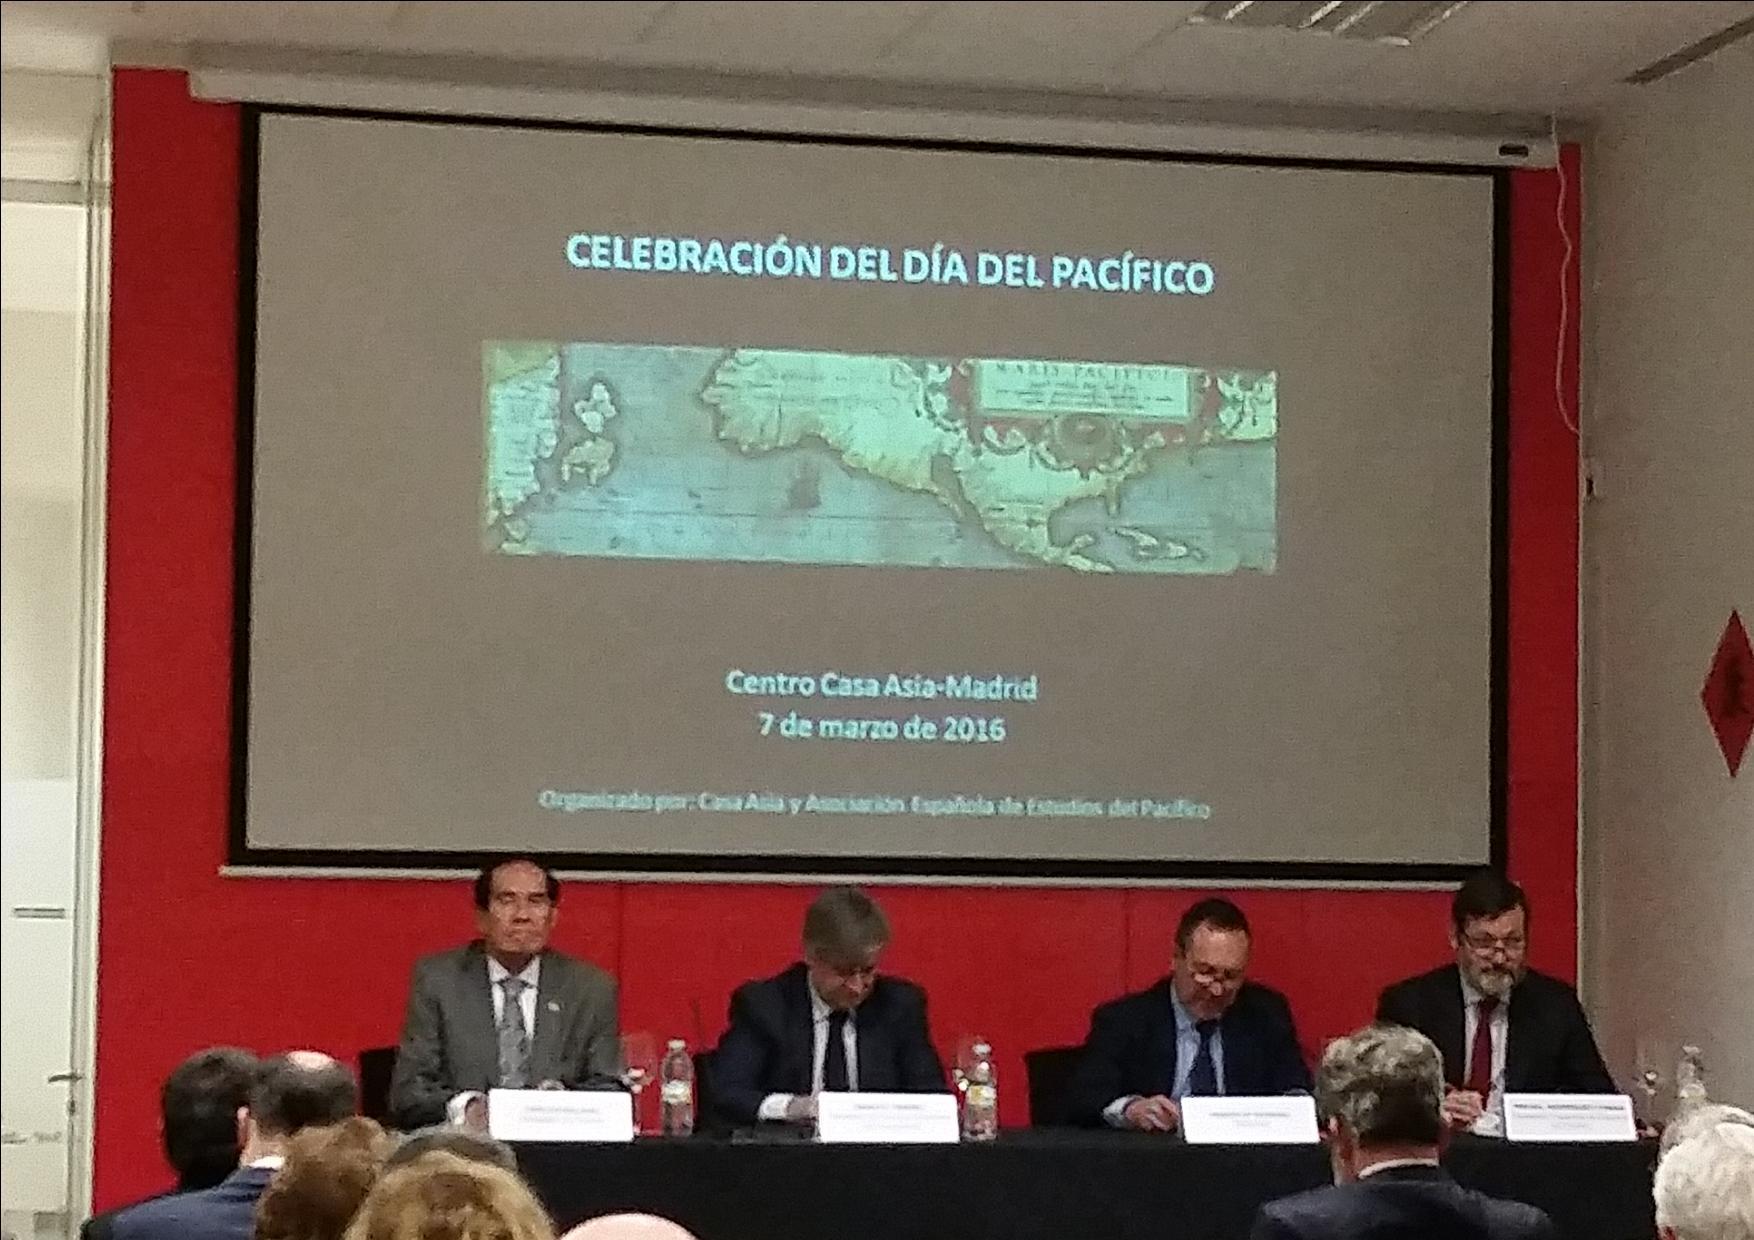 L-R: Amb. Carlos Salinas; Sec. of State for Foreign Affairs Ignacio Ybañez; Casa Asia Dir. Gen. Ramon María Moreno; Instituto Cervantes Sec. Gen. Rafael Rodríguez-Ponga.